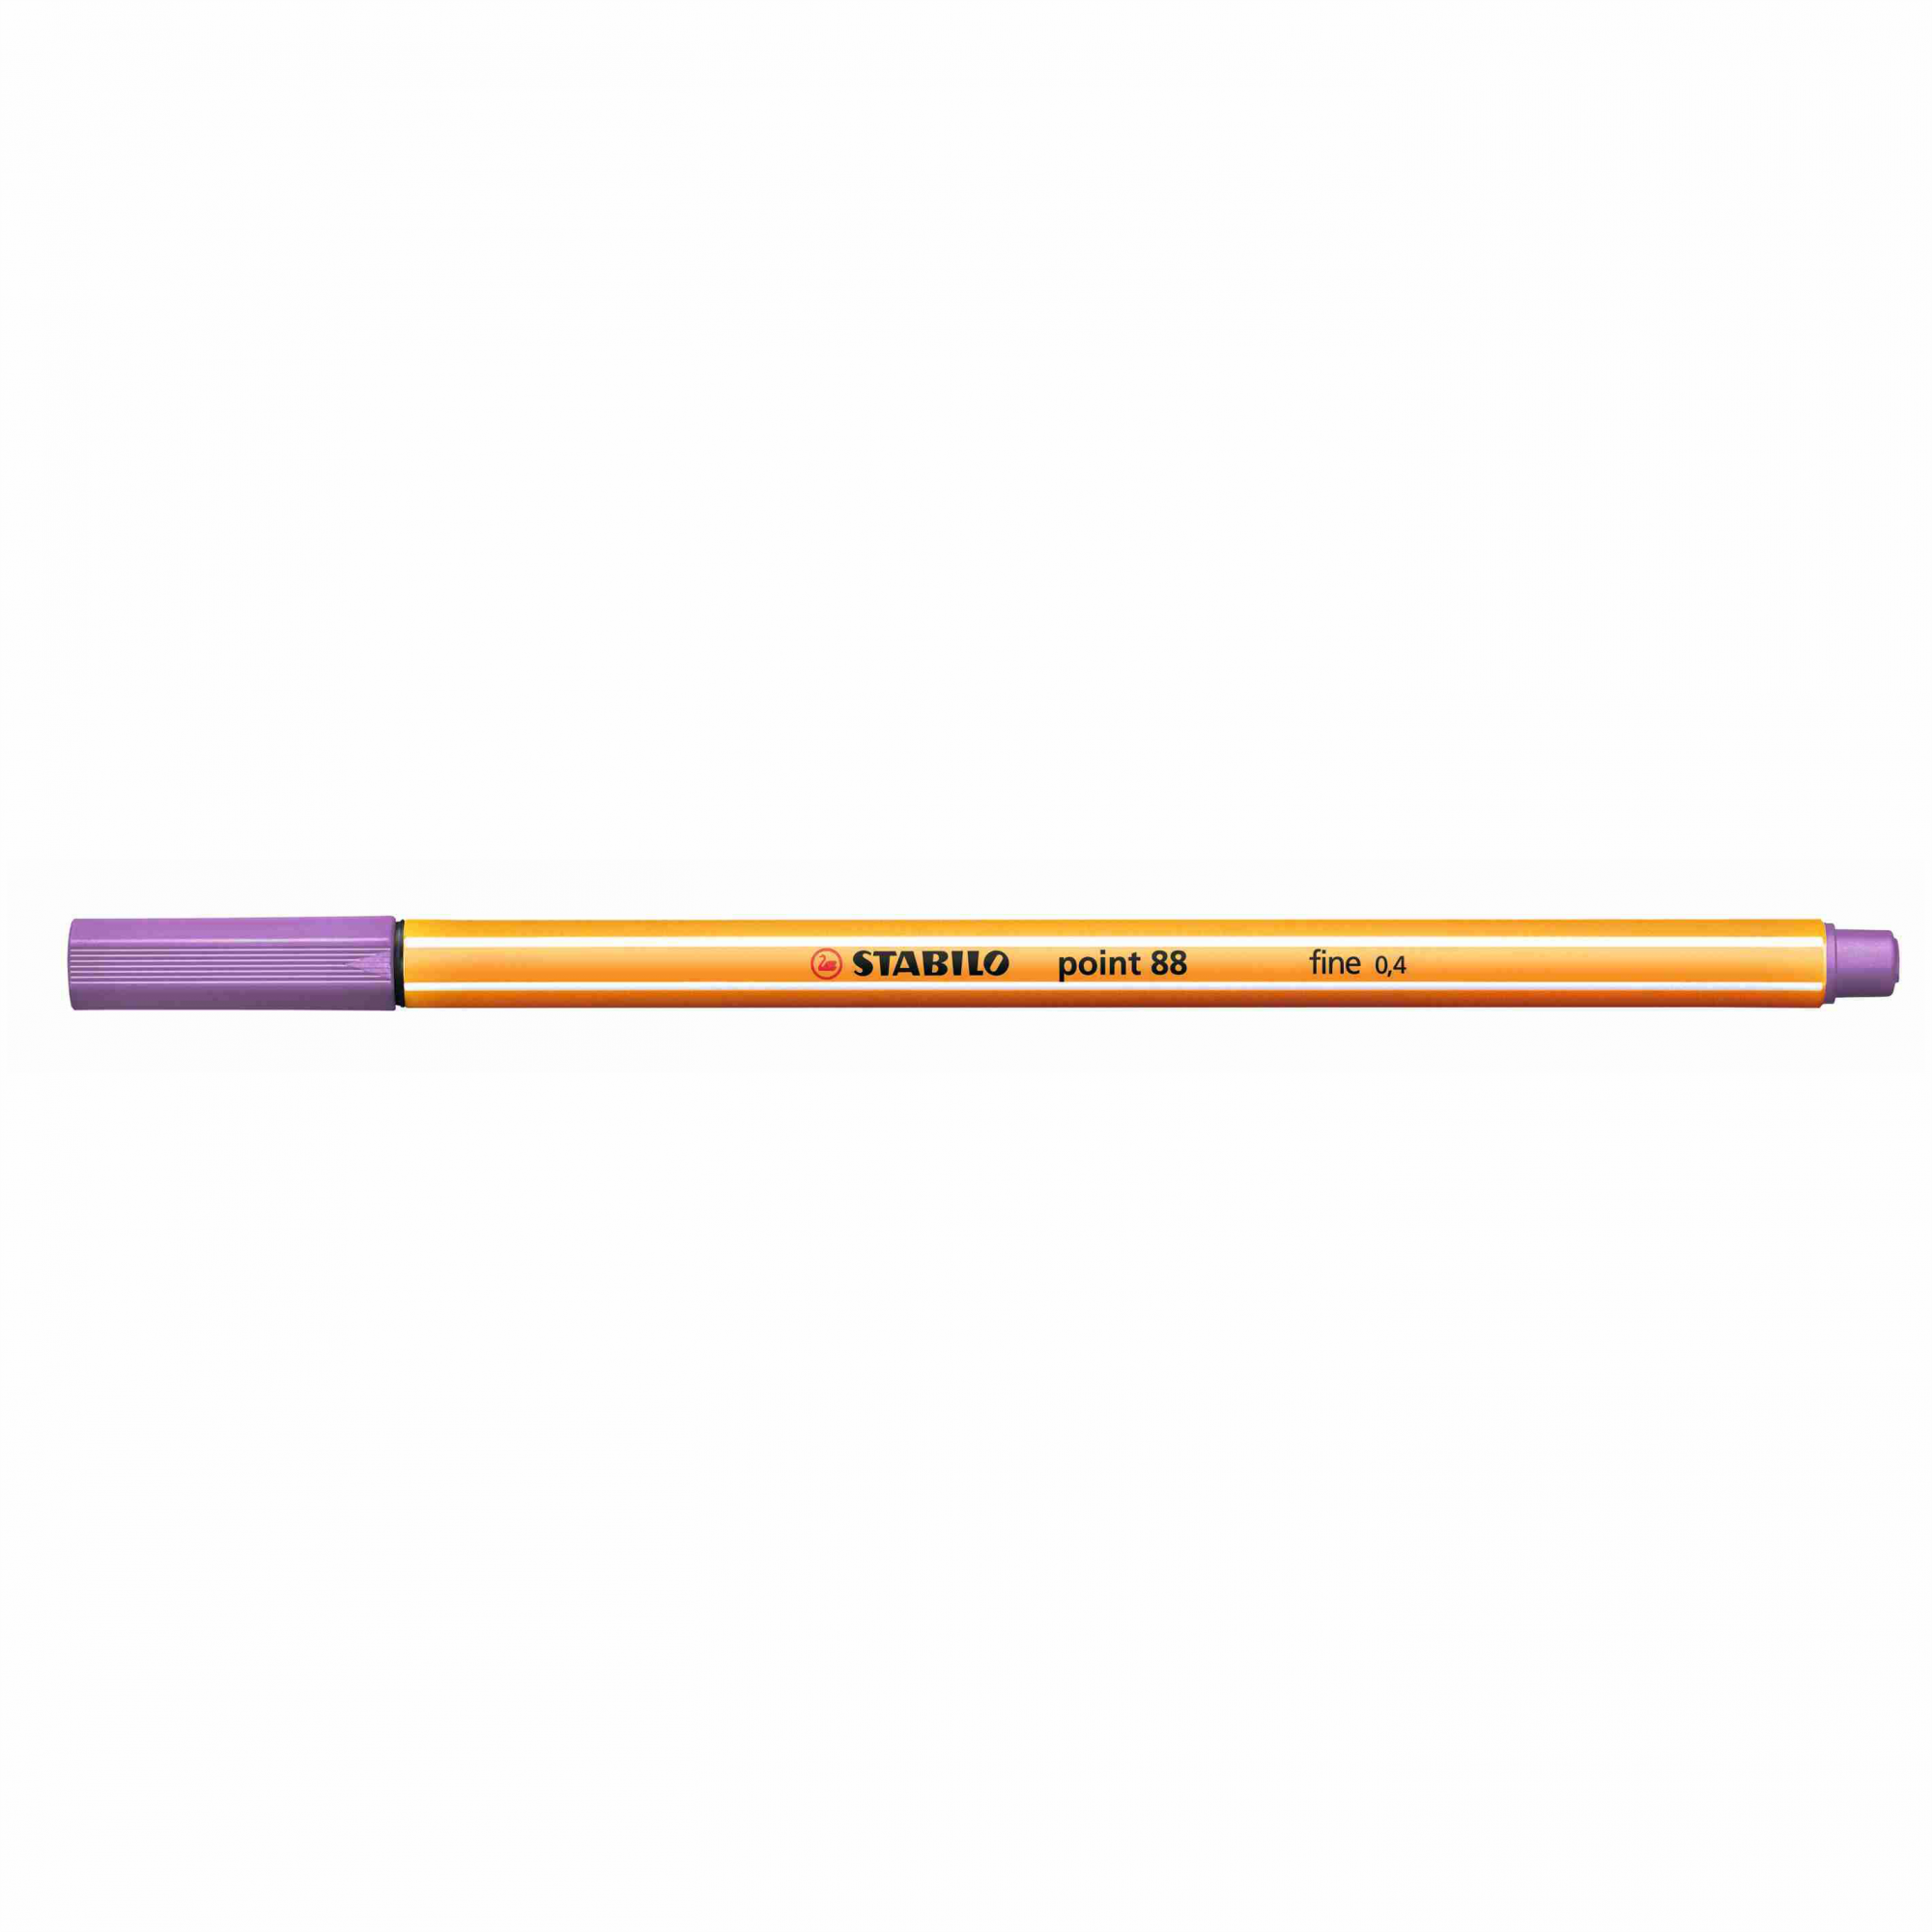 Caneta Hidrográfica 0.4 lilás claro POINT 88 Stabilo